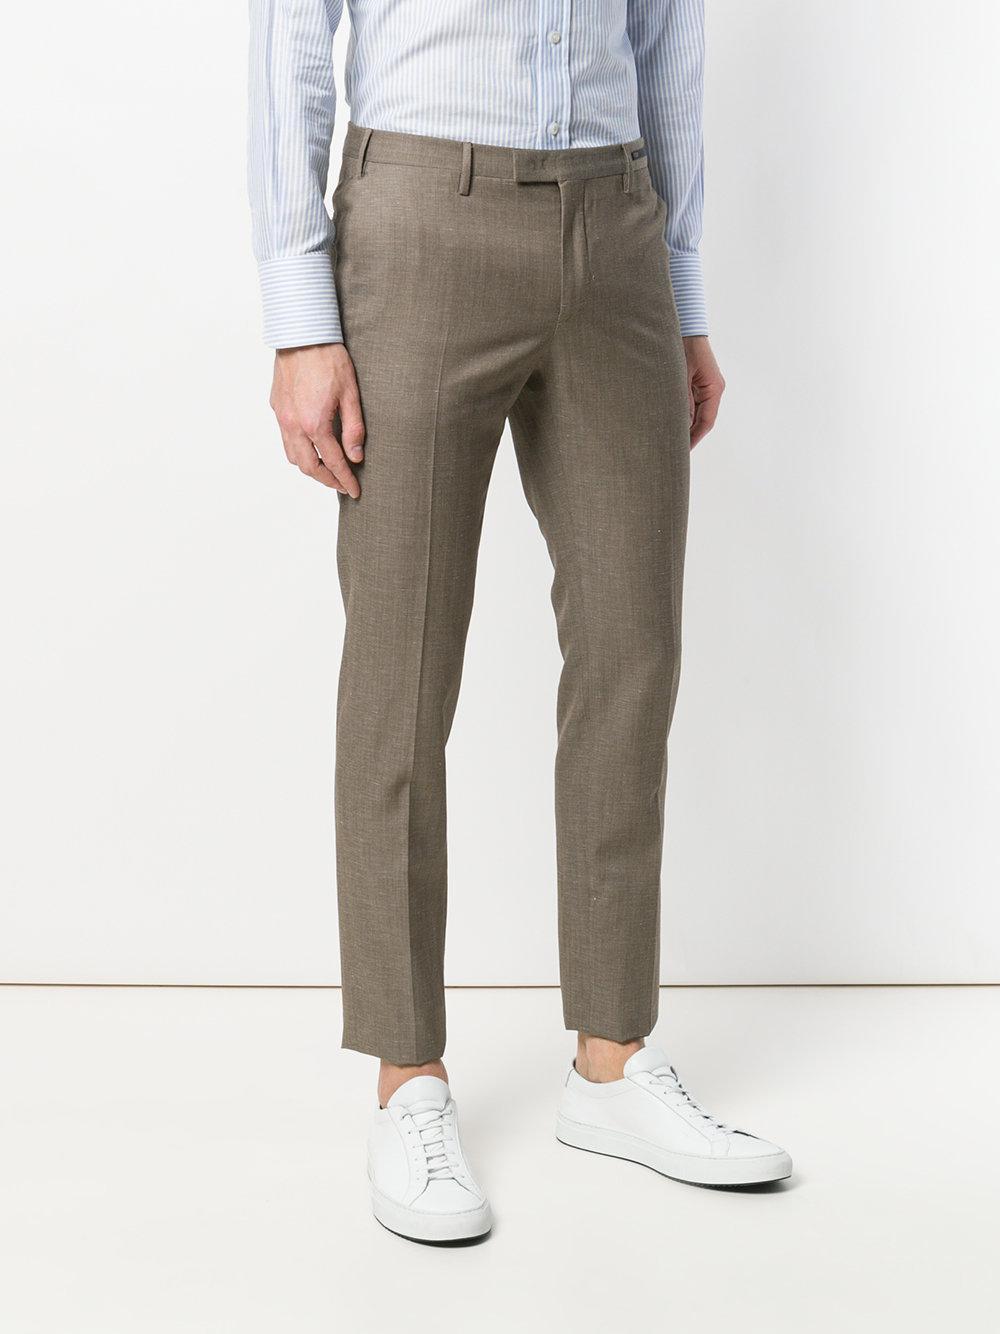 PT01 Wool Skinny Trousers in Brown for Men